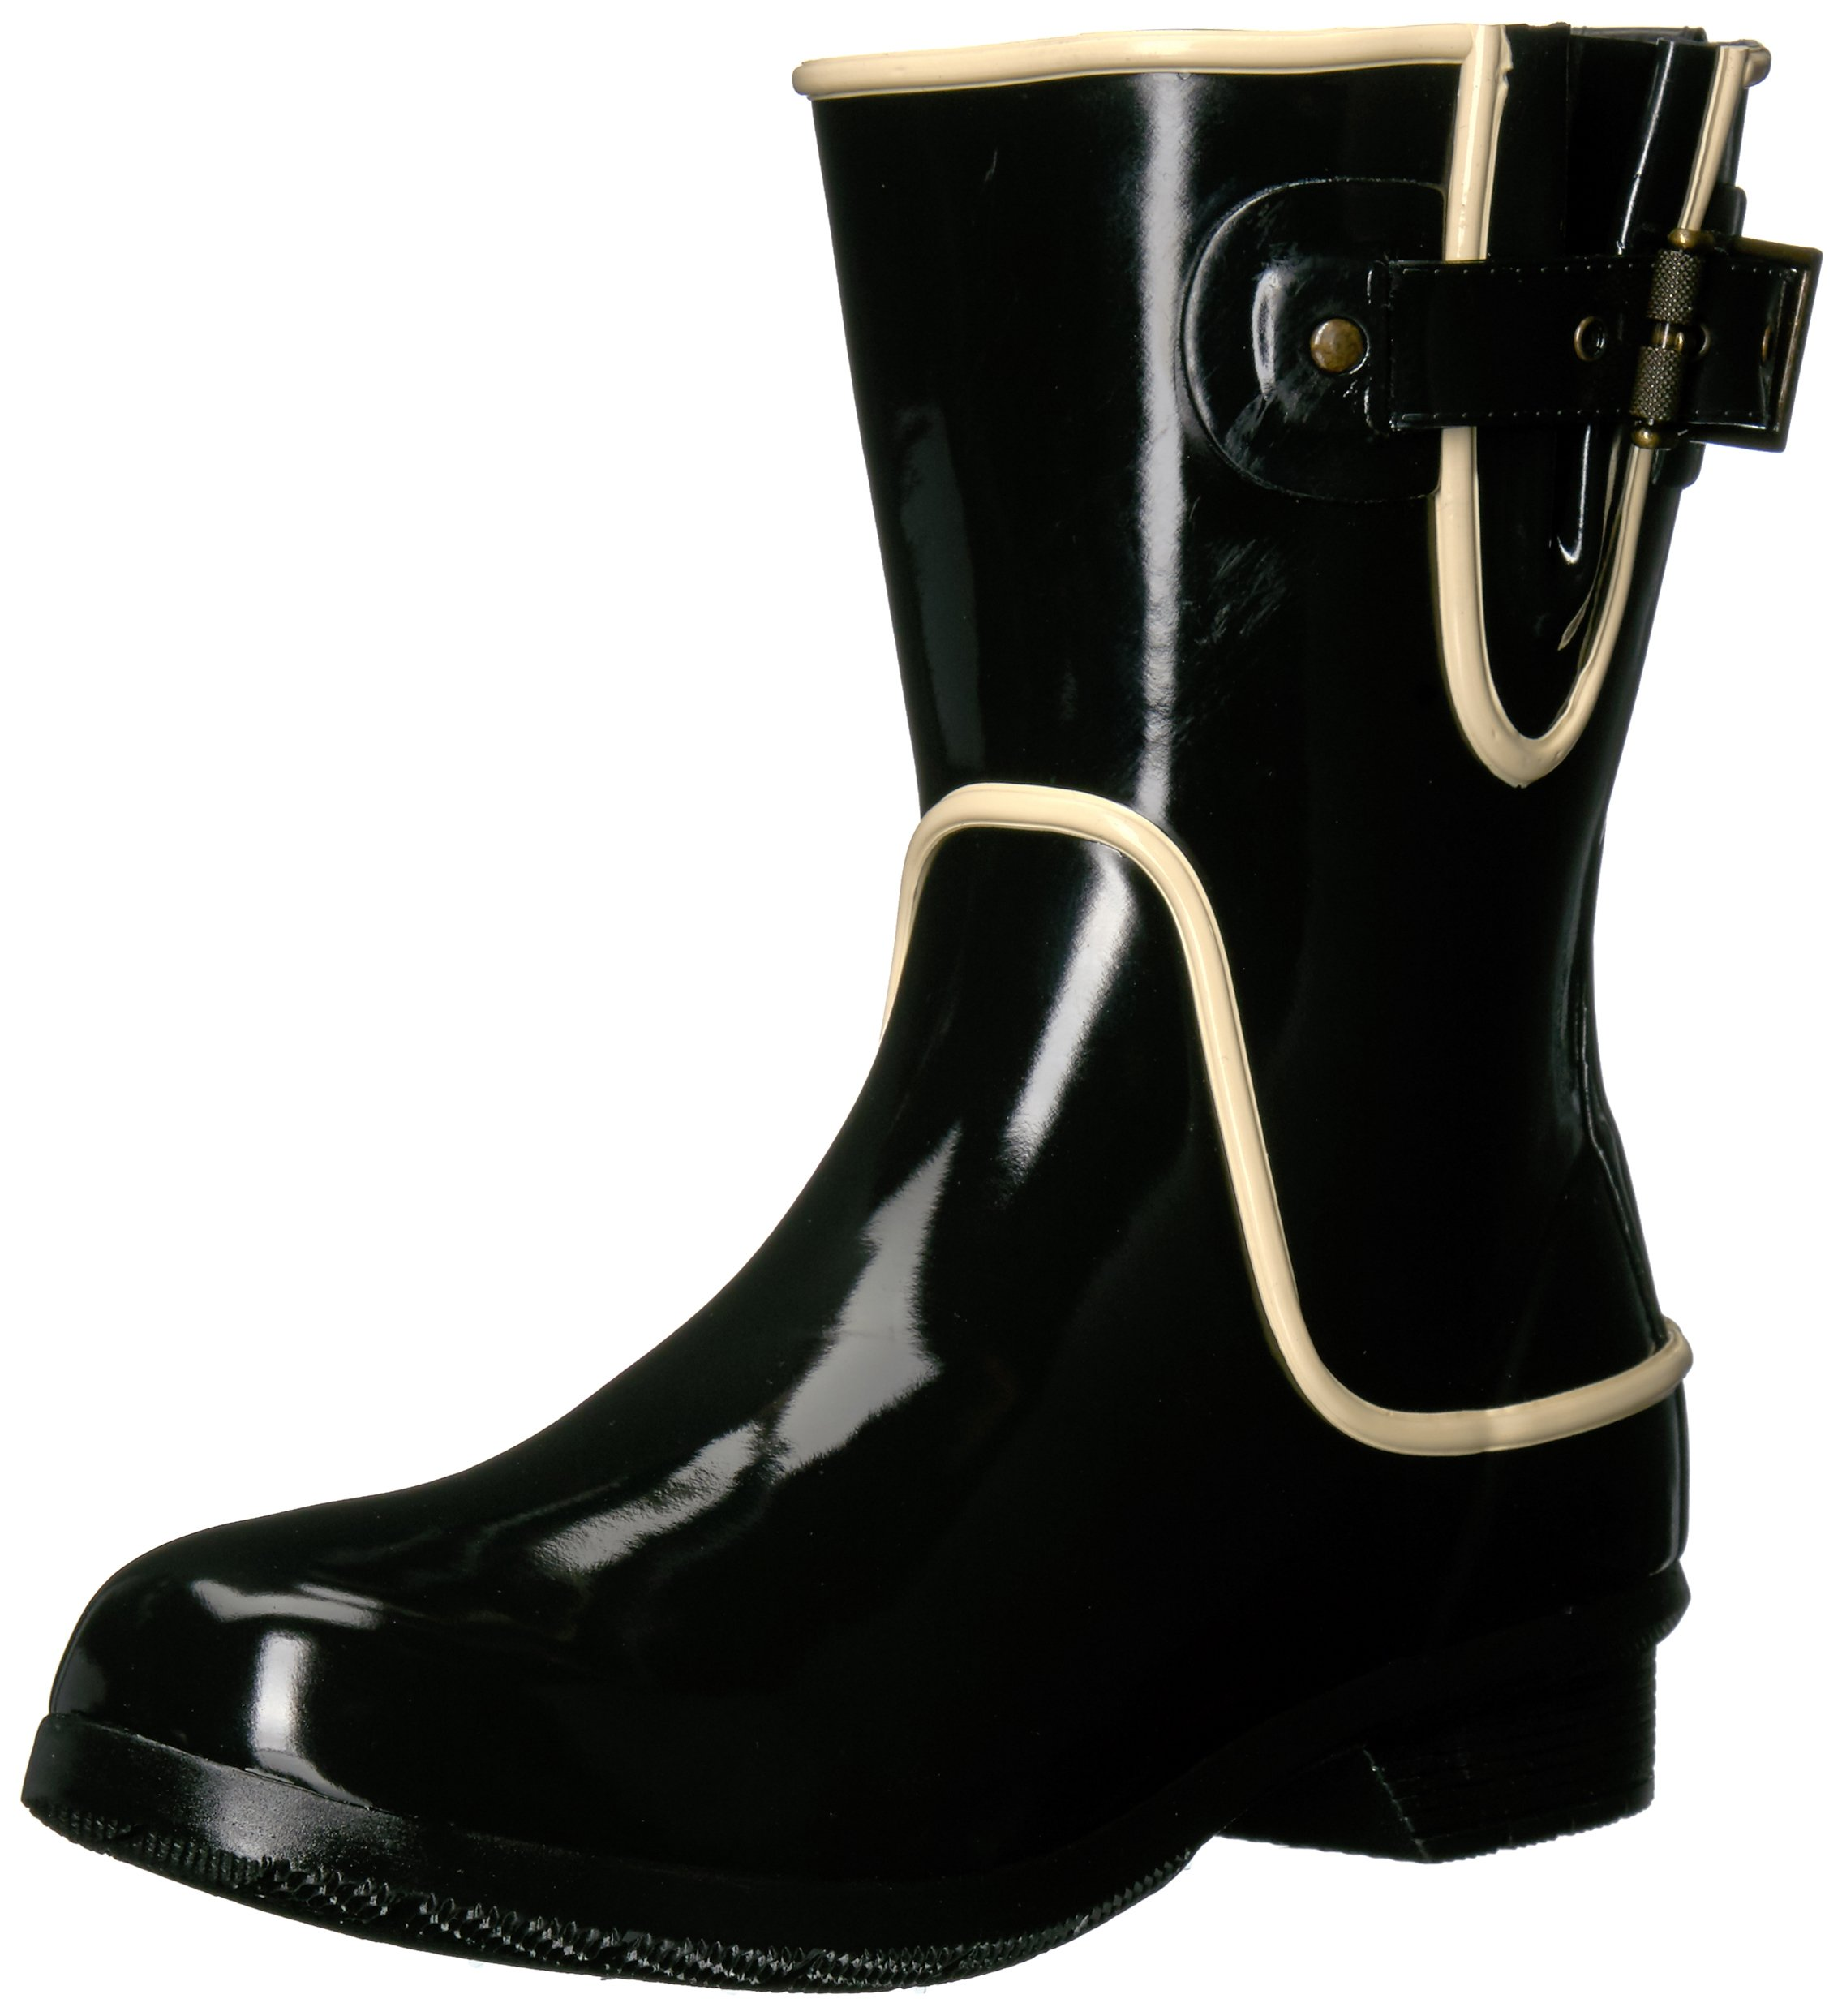 Chooka Women's Waterproof Mid-Height Printed Rain Boot with Memory Foam, Fine Line Black, 7 M US